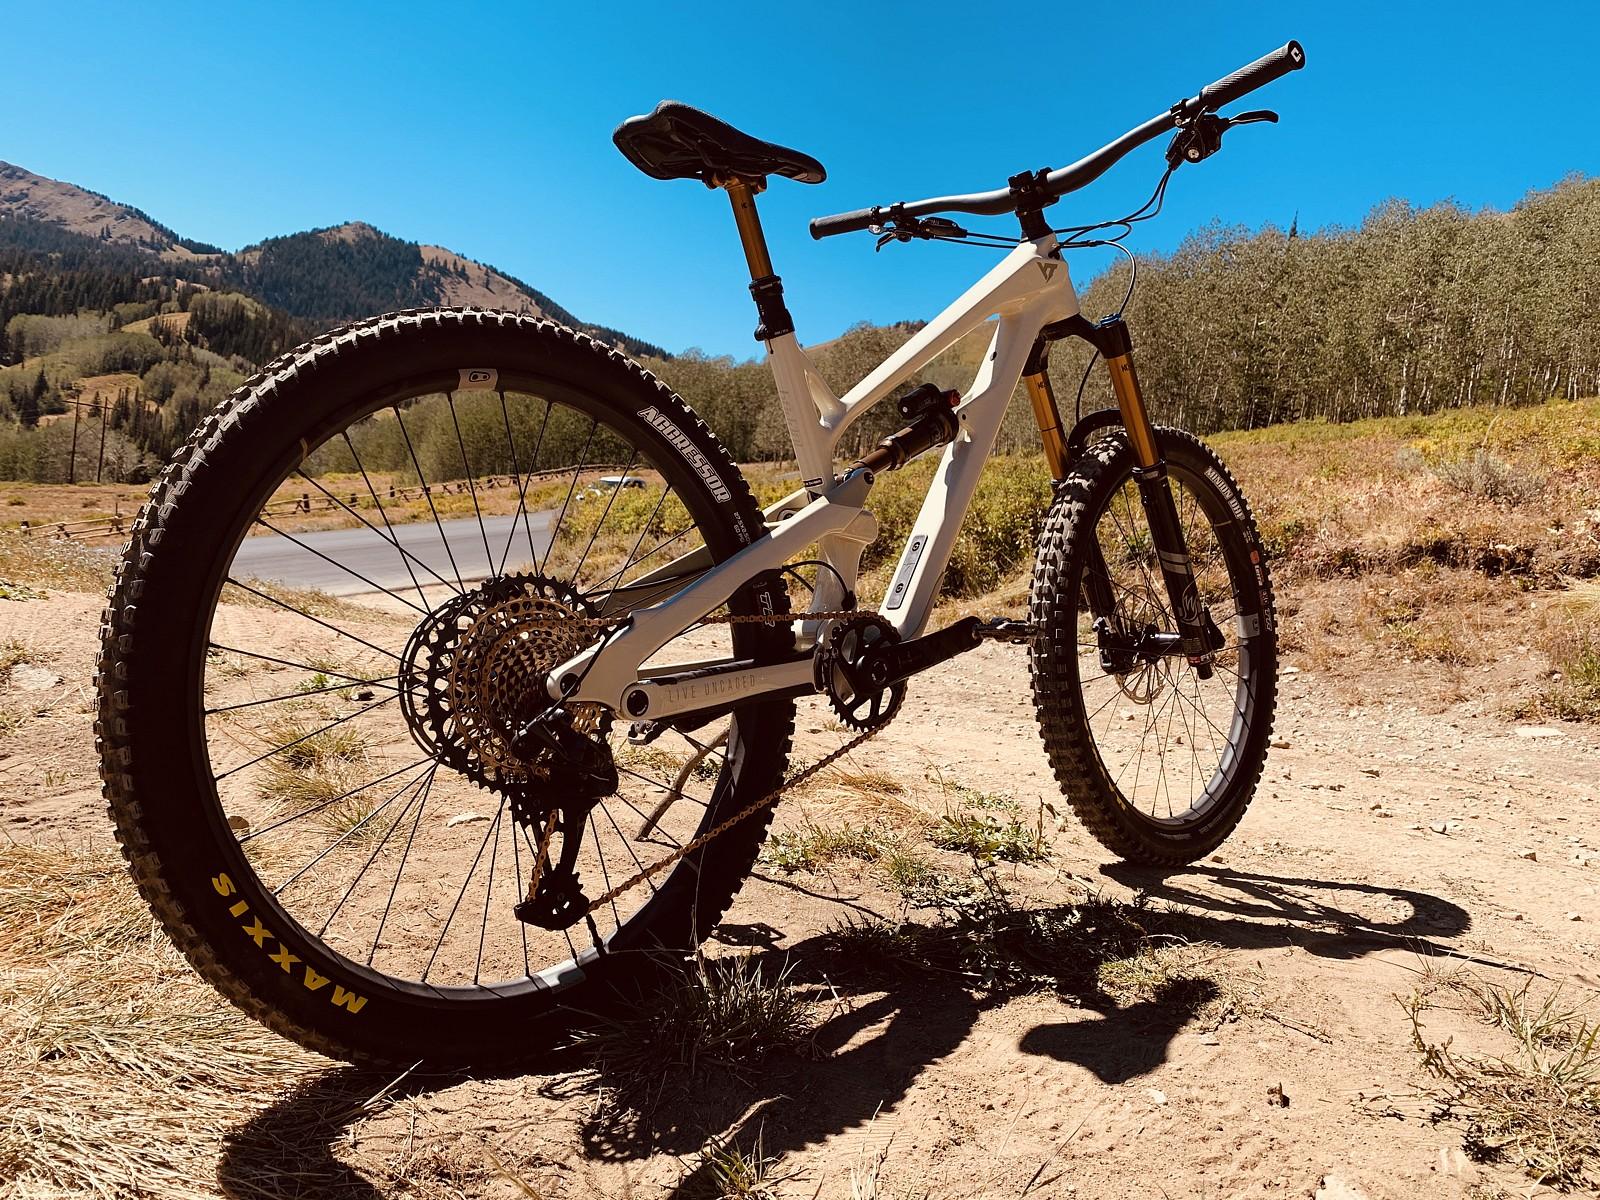 IMG E0215 - jaykalafatis - Mountain Biking Pictures - Vital MTB